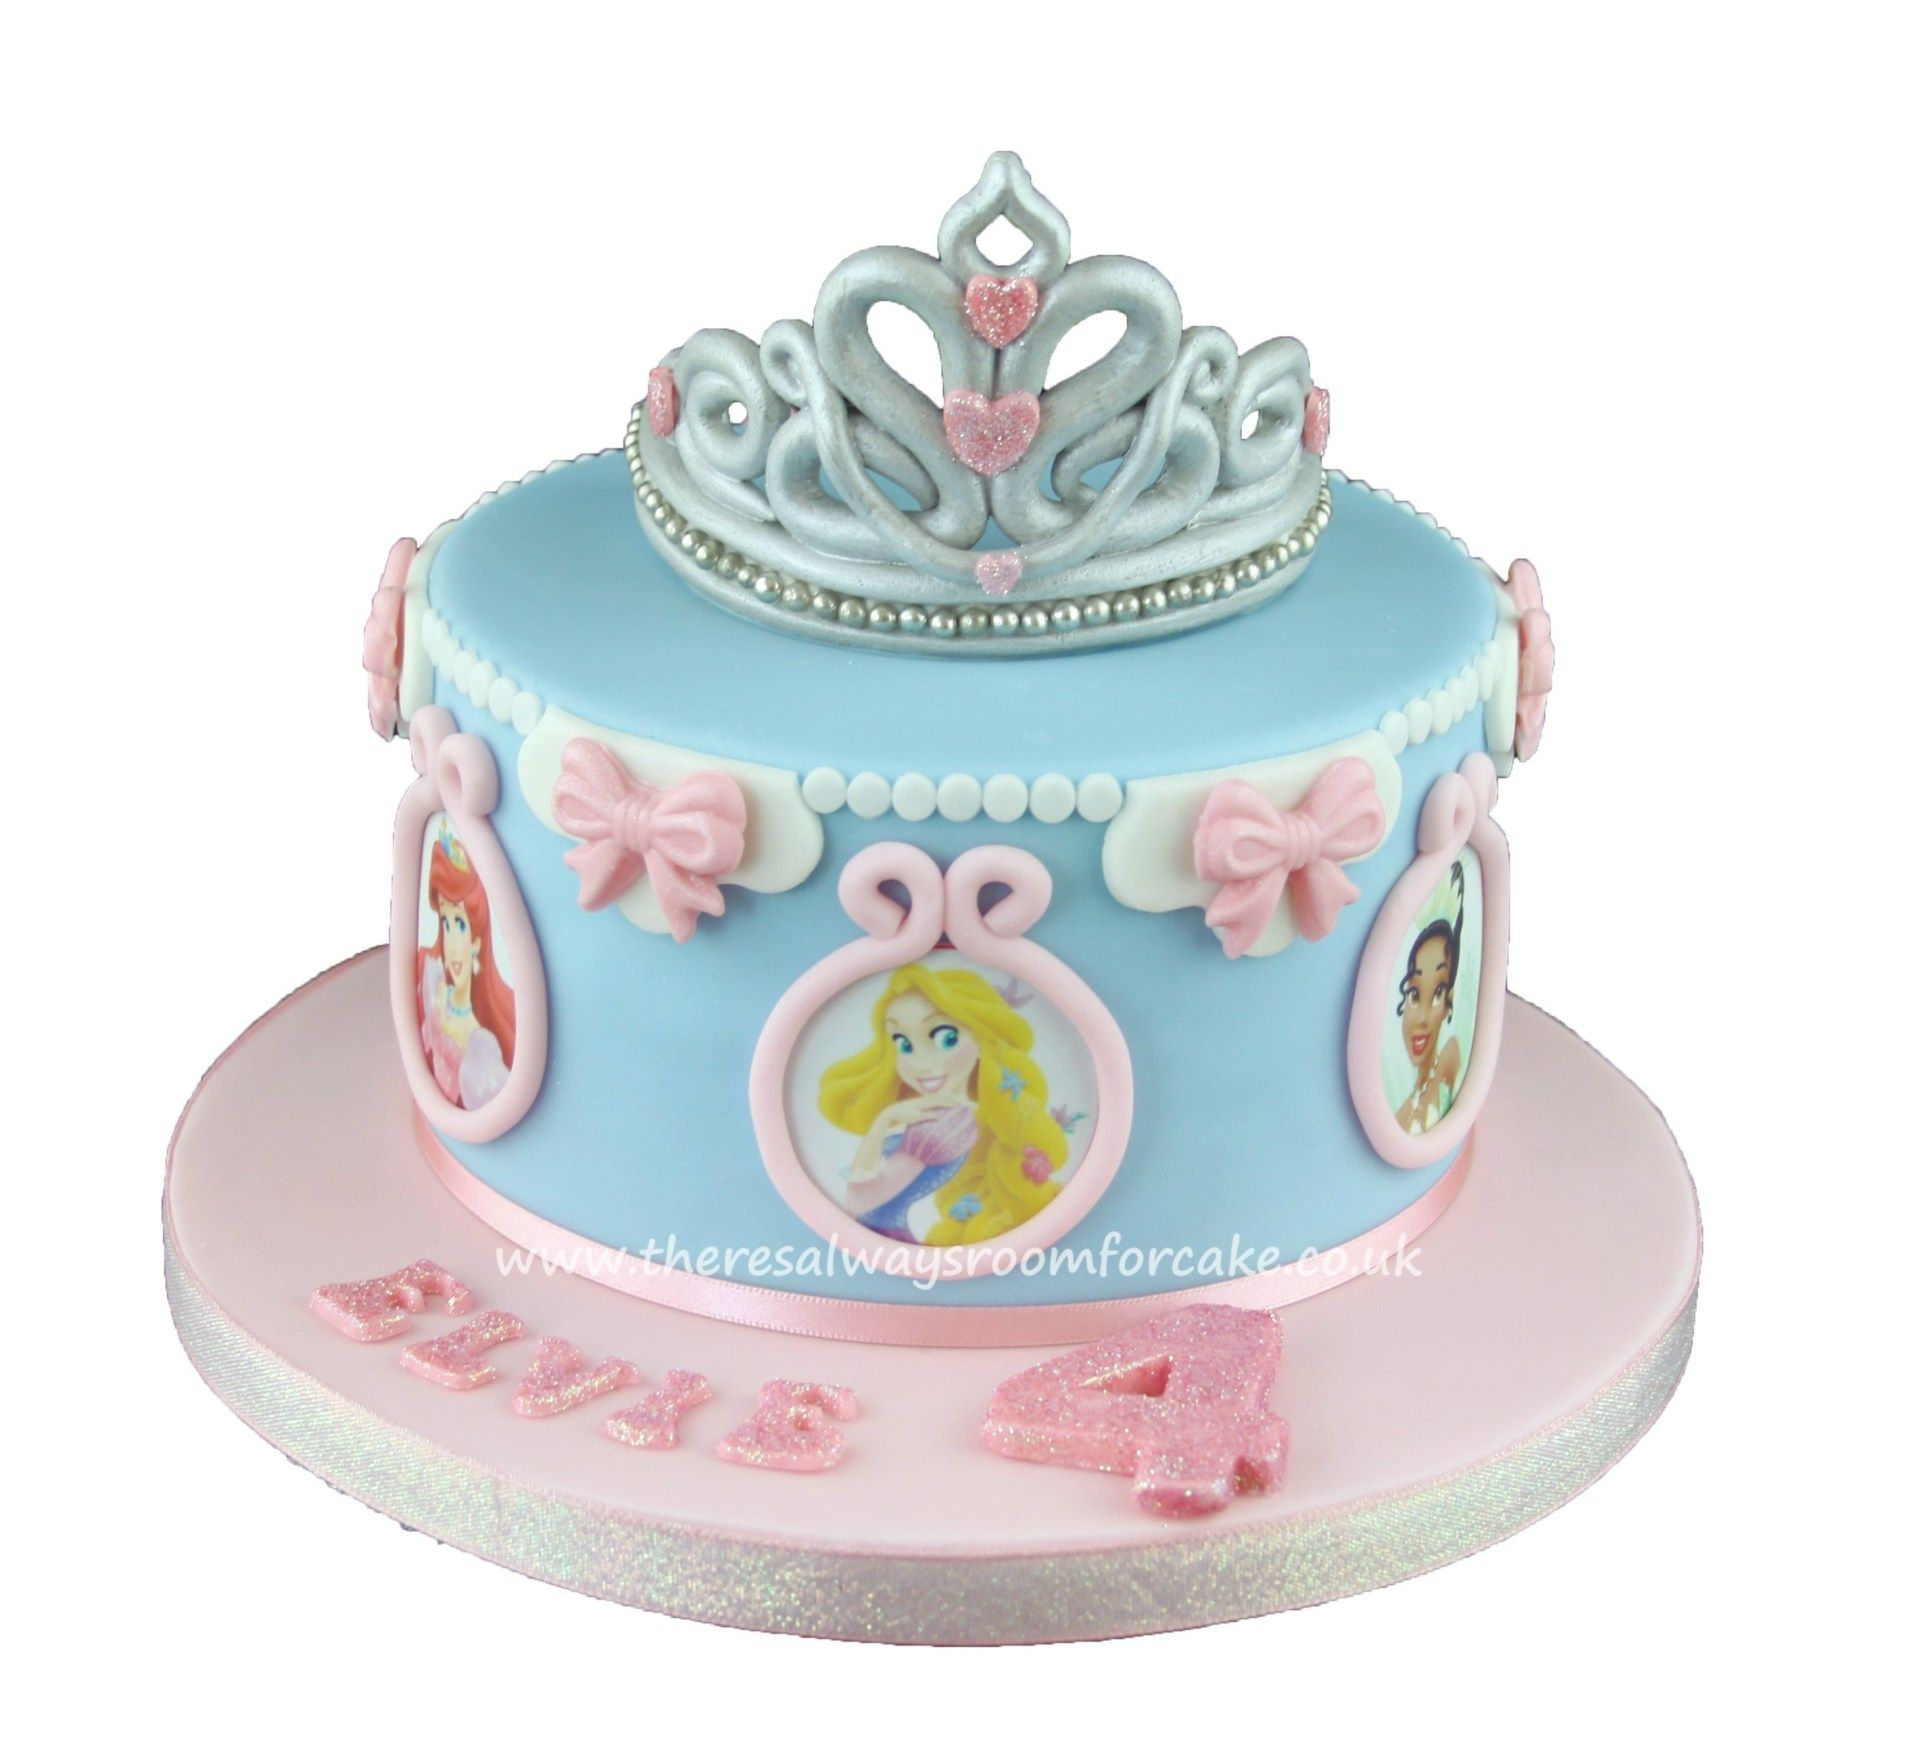 27 exclusive photo of disney princess birthday cakes